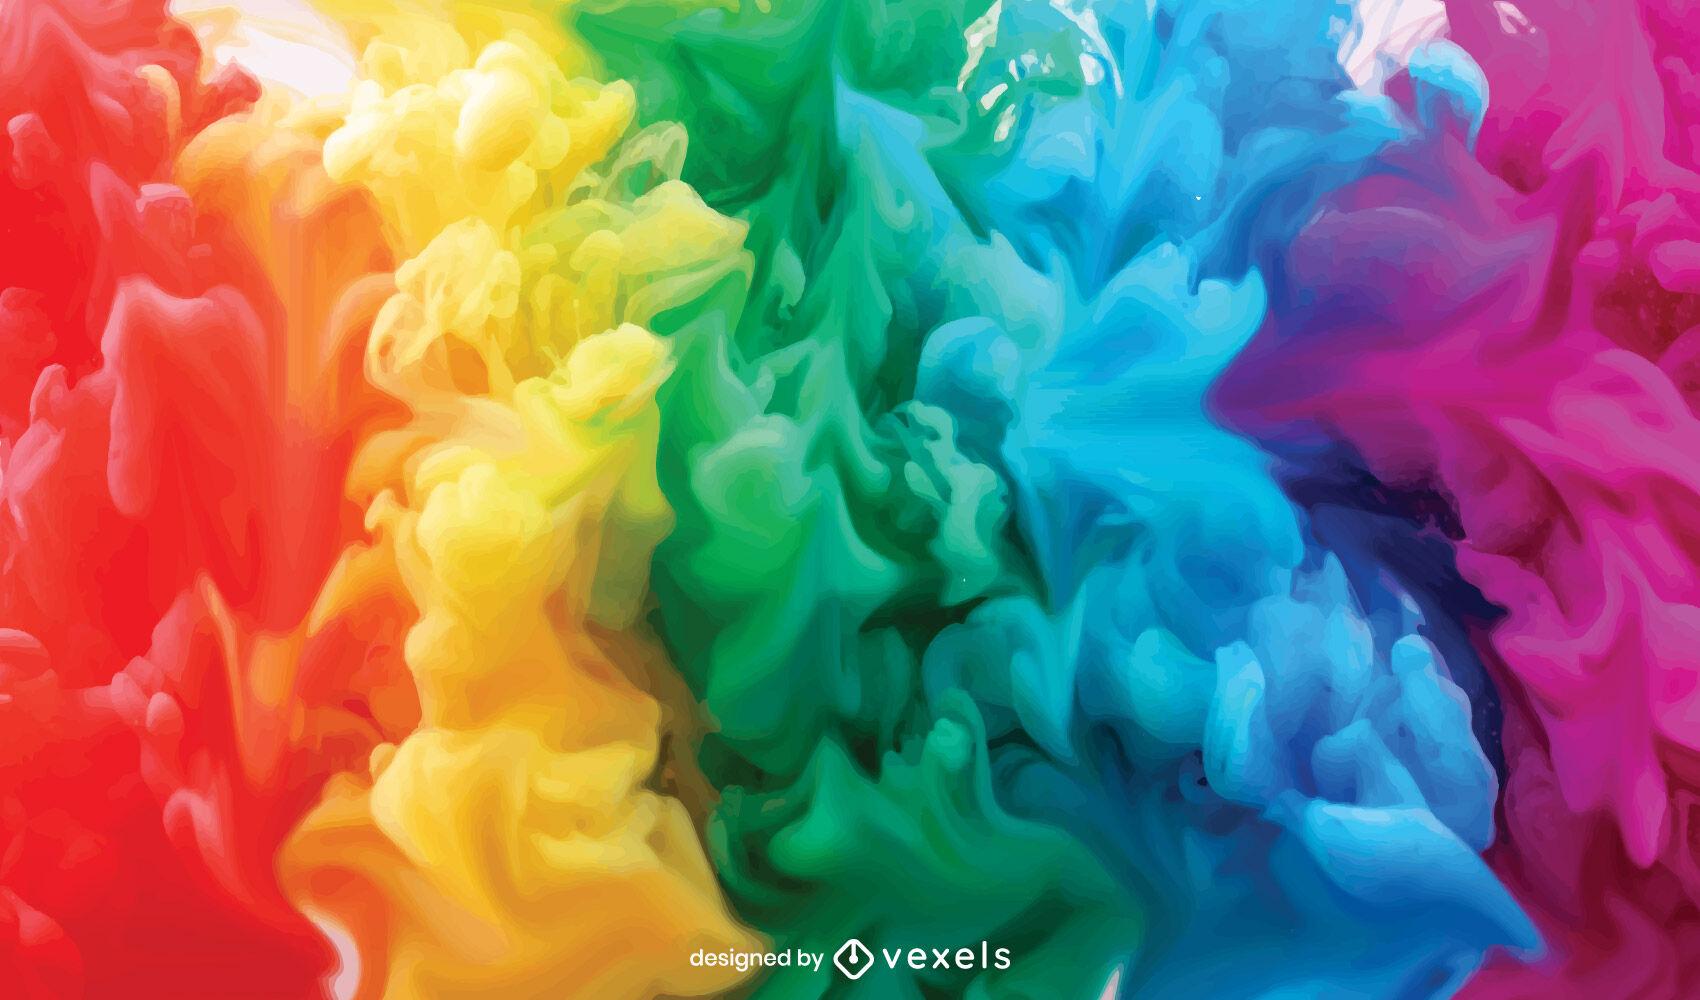 Dise?o de fondo de nube de humo de arco iris